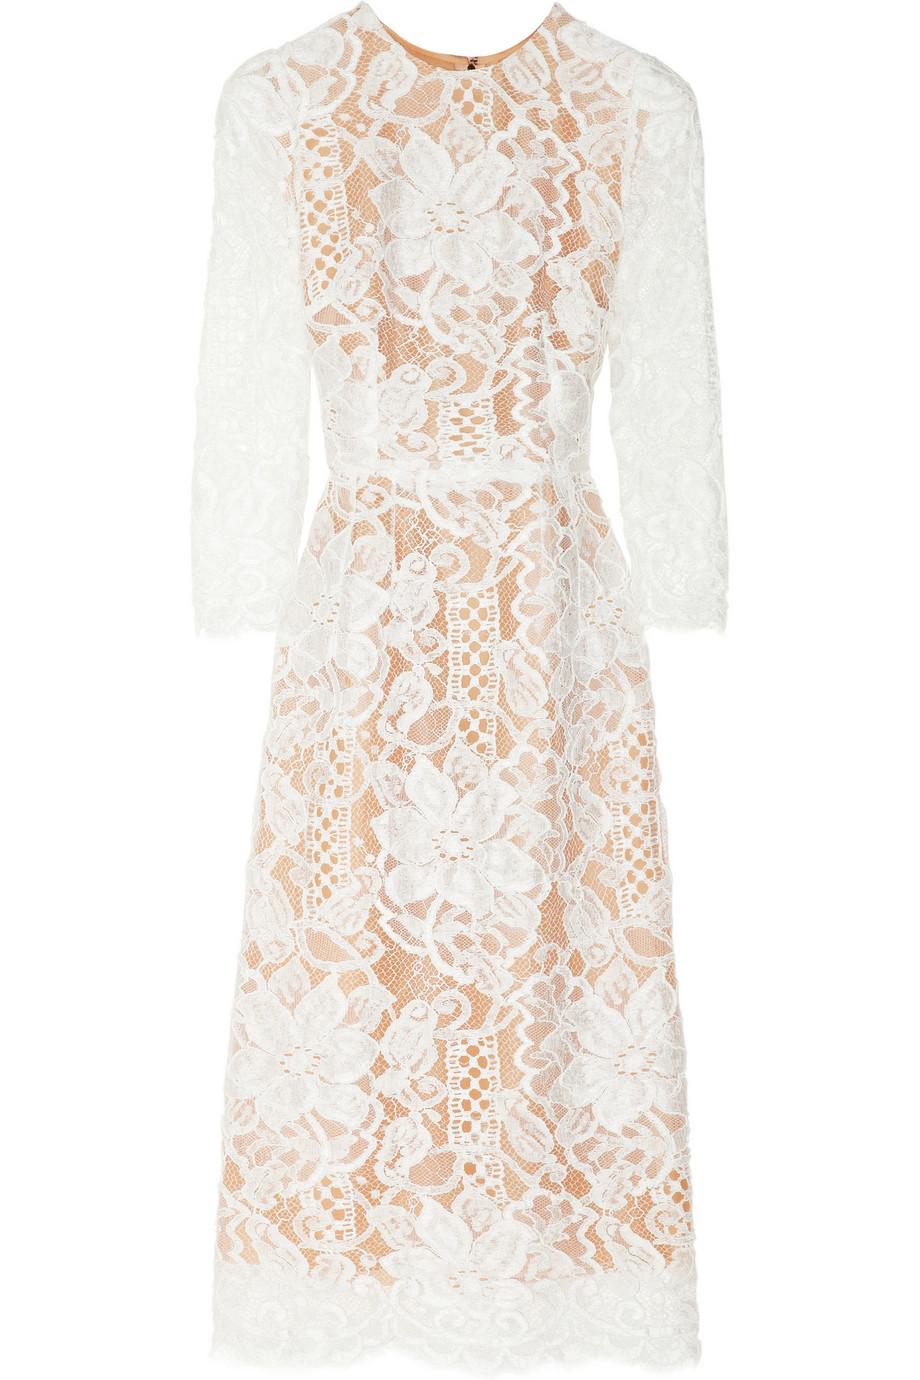 5dd43b40c2e Dolce   Gabbana Lace and Silk-organza Midi Dress in White - Lyst